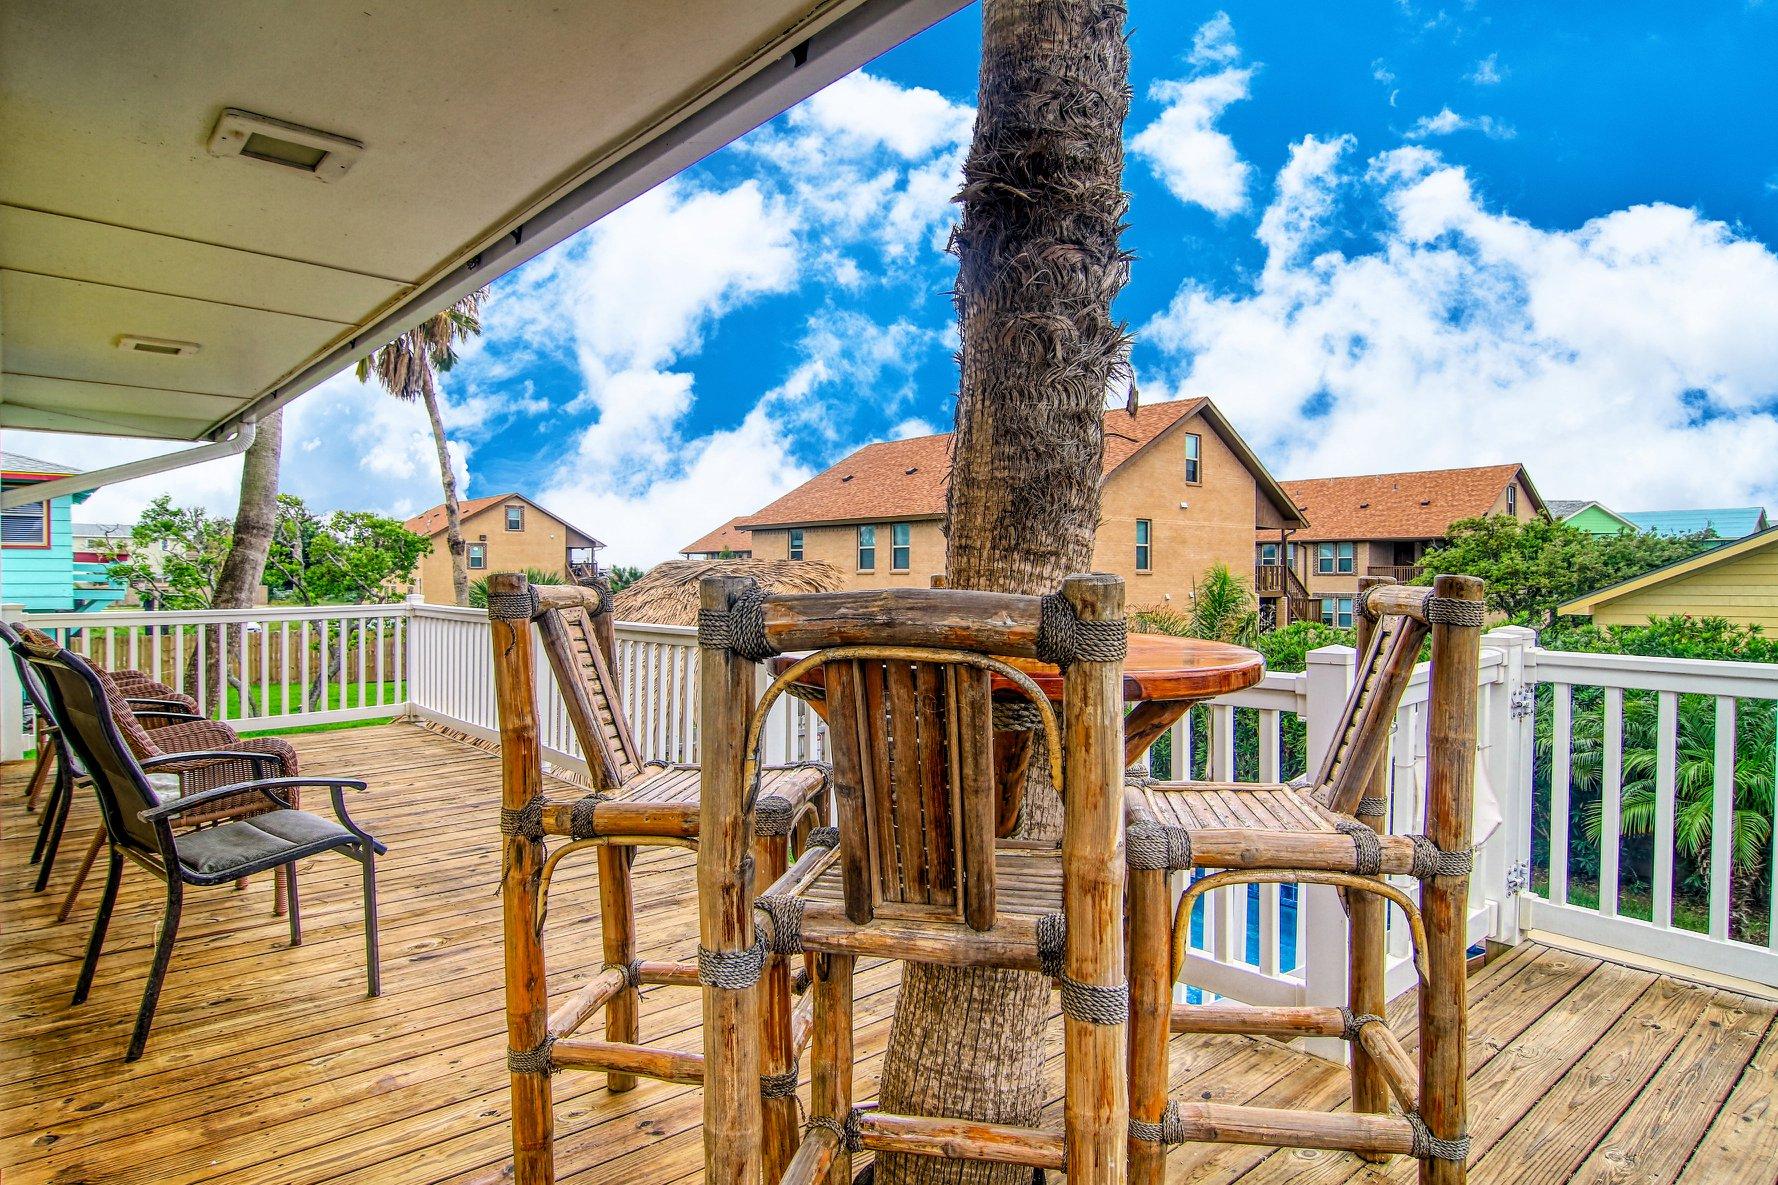 Port A Beach House Company Port Aransas Vacation Home Deck Mustang Island Texas Gulf Coast.